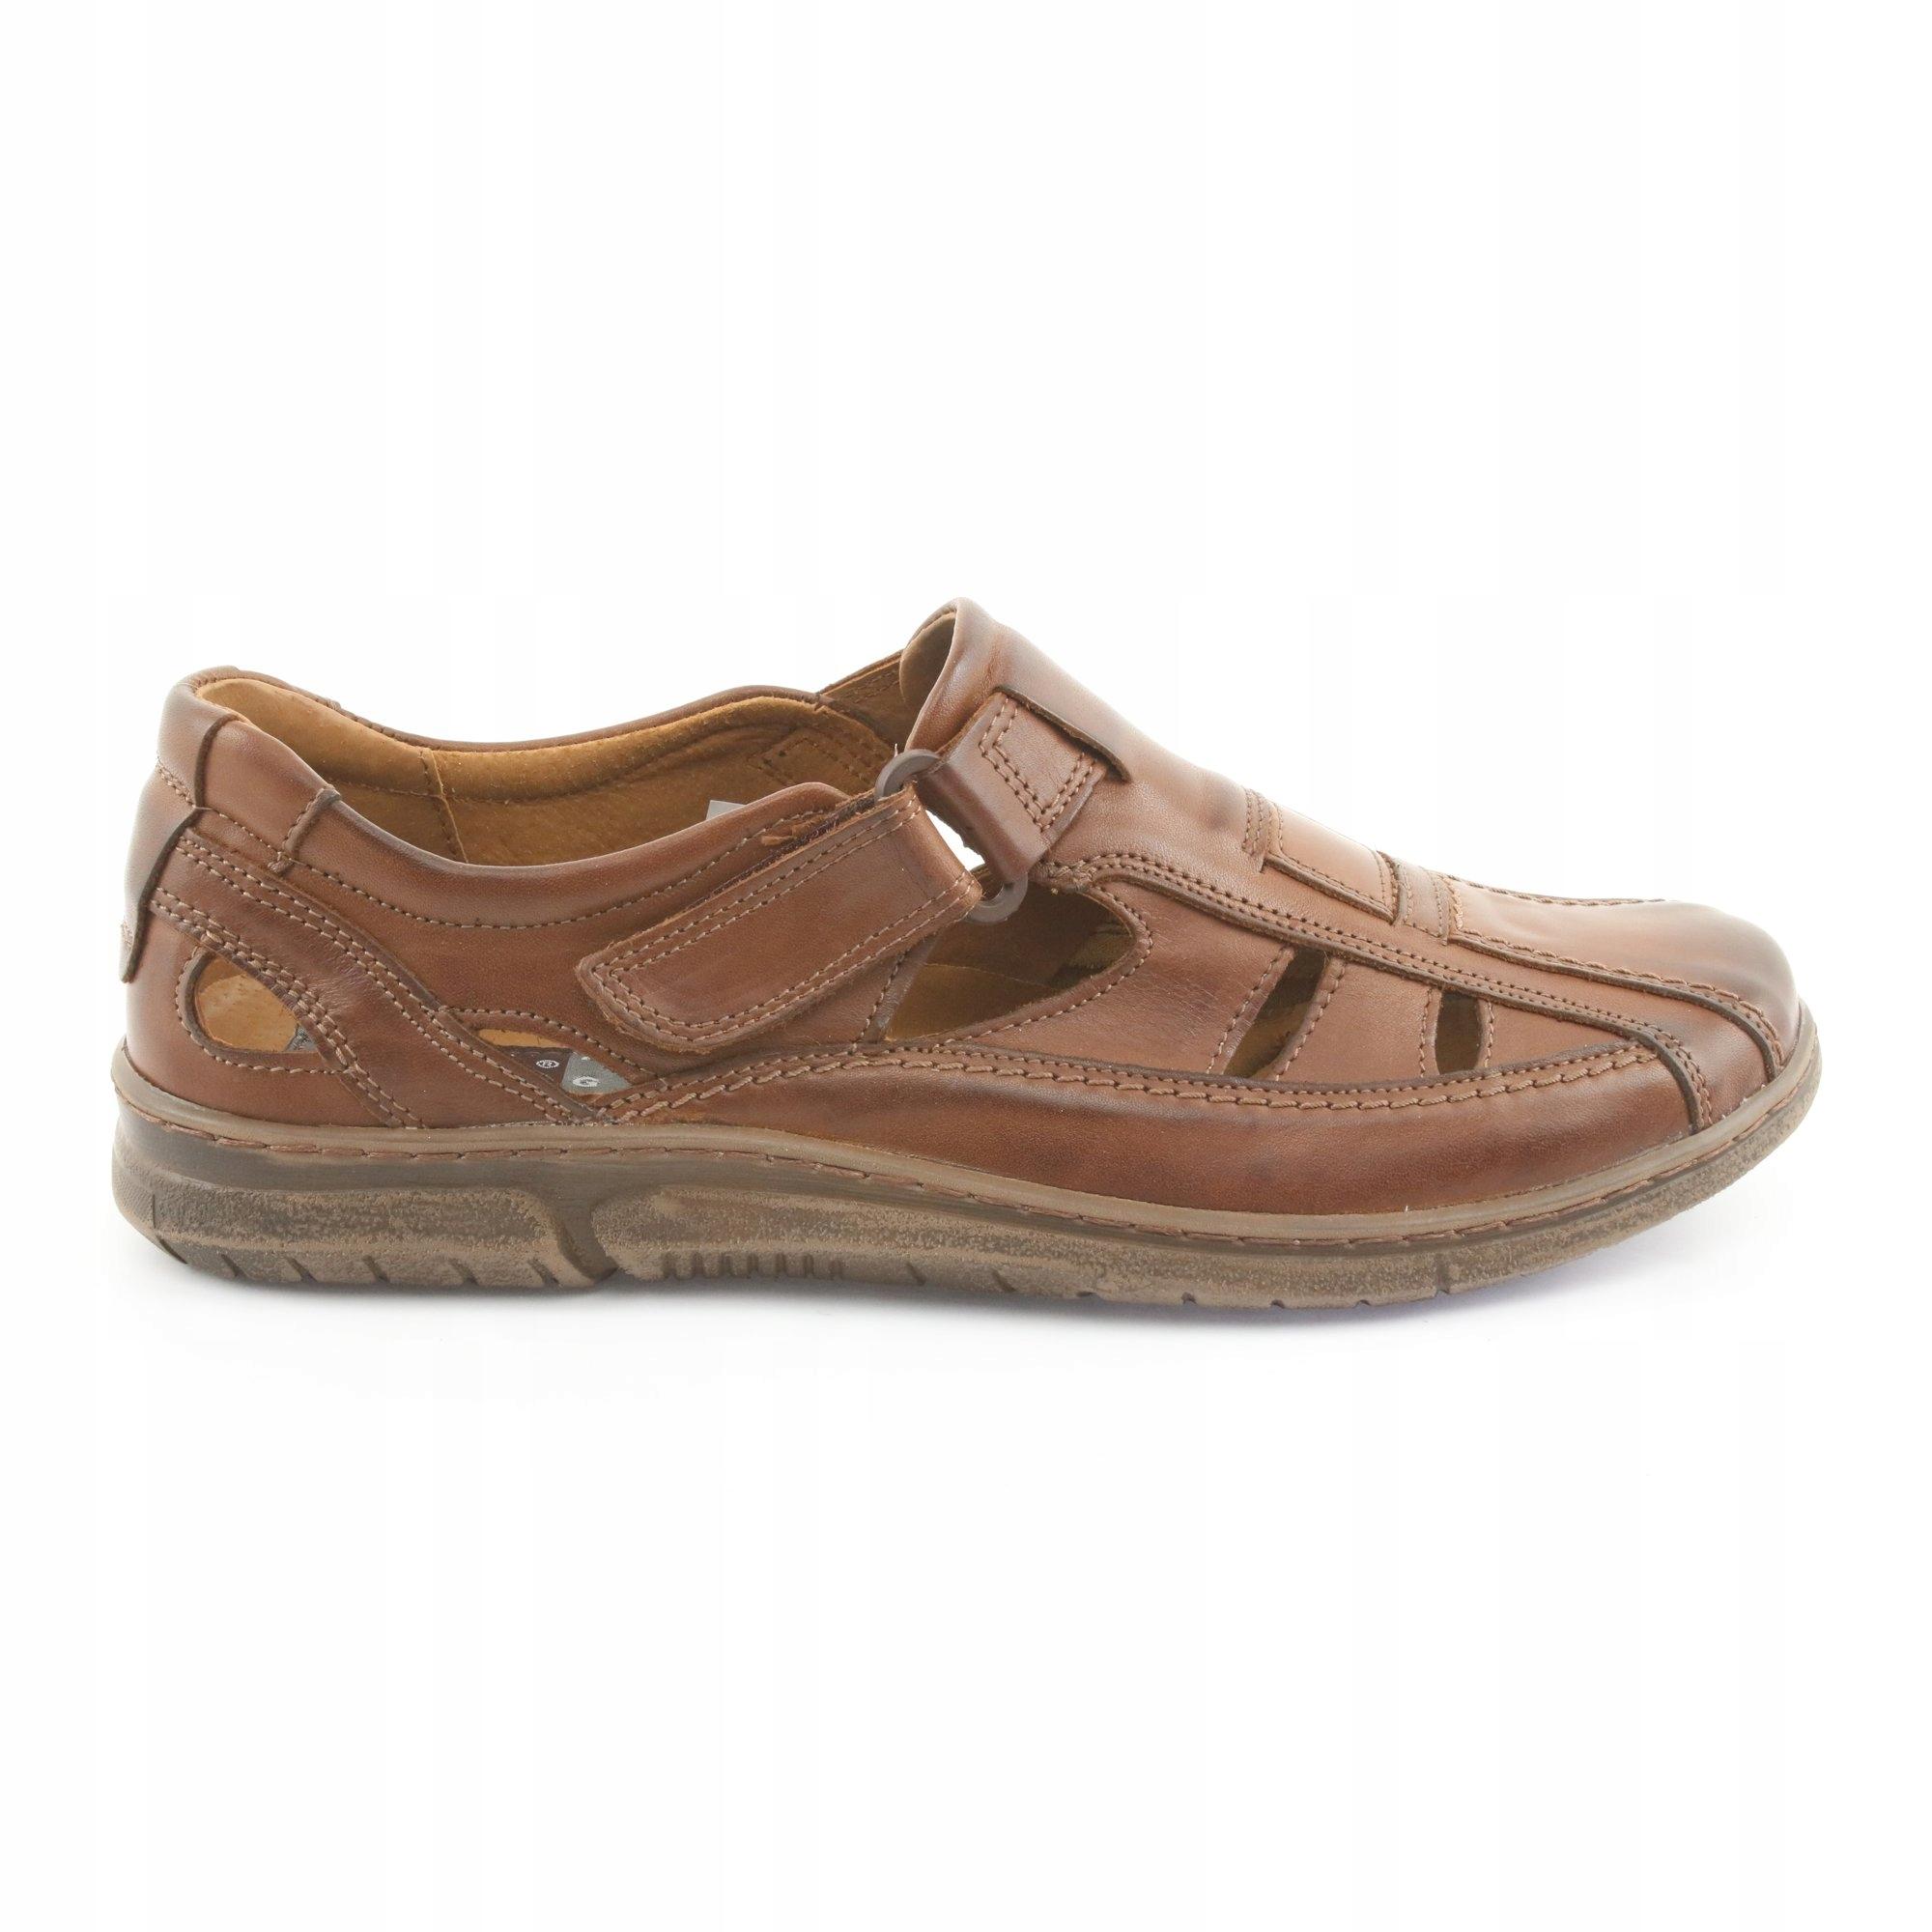 Sandały męskie komfort Riko 458 r.42